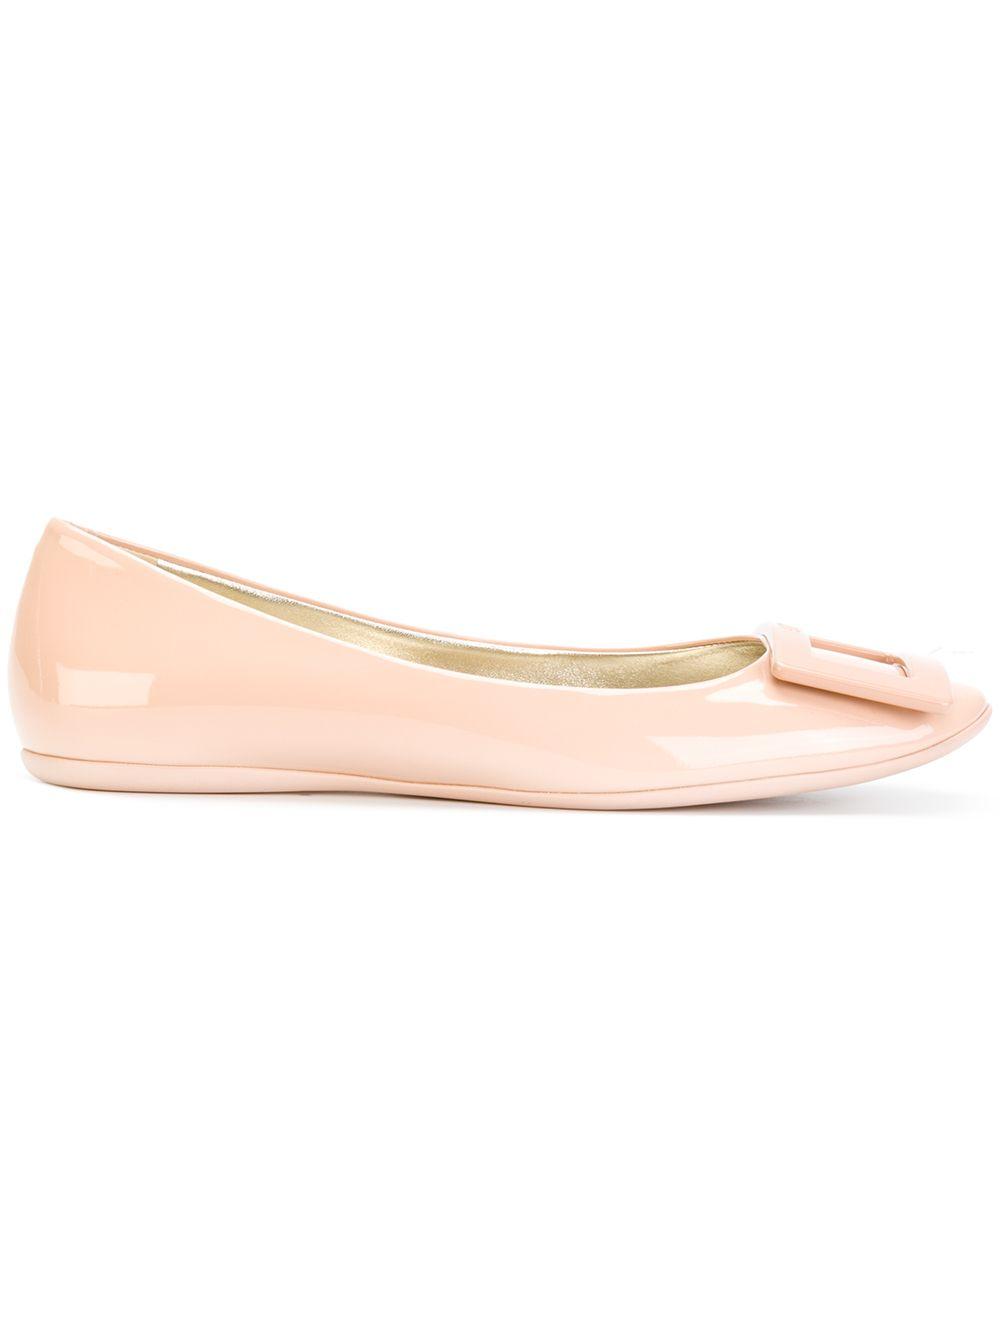 Gommette Leather Ballets